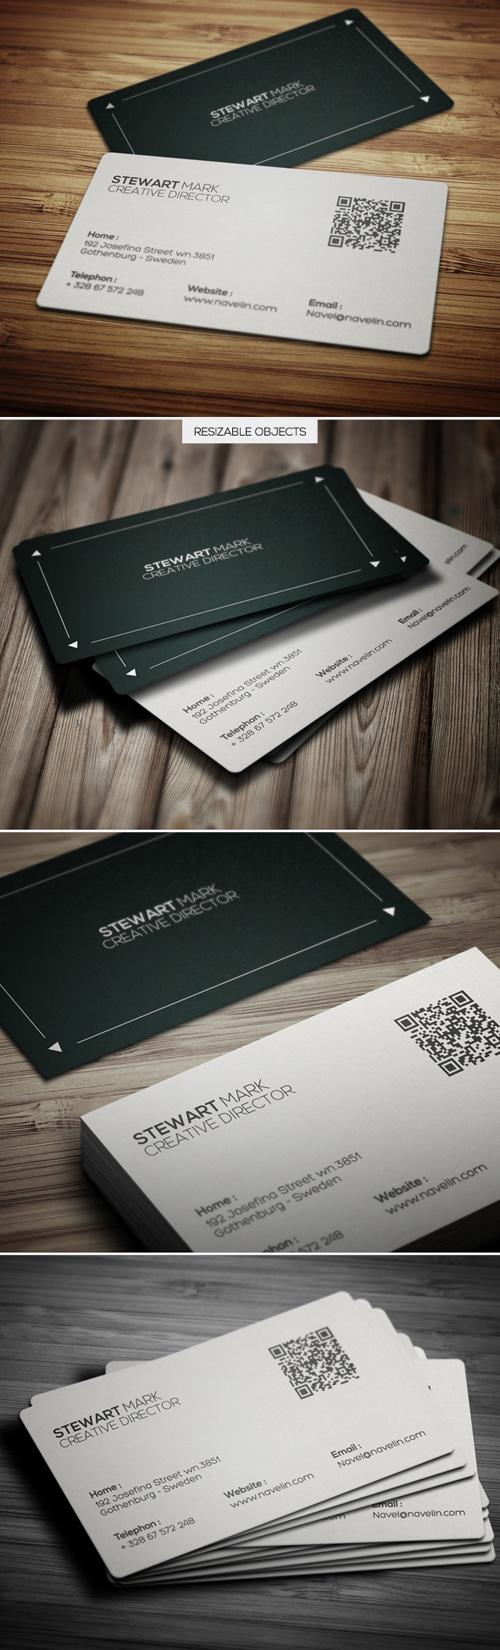 Creative Business Cards Design-2